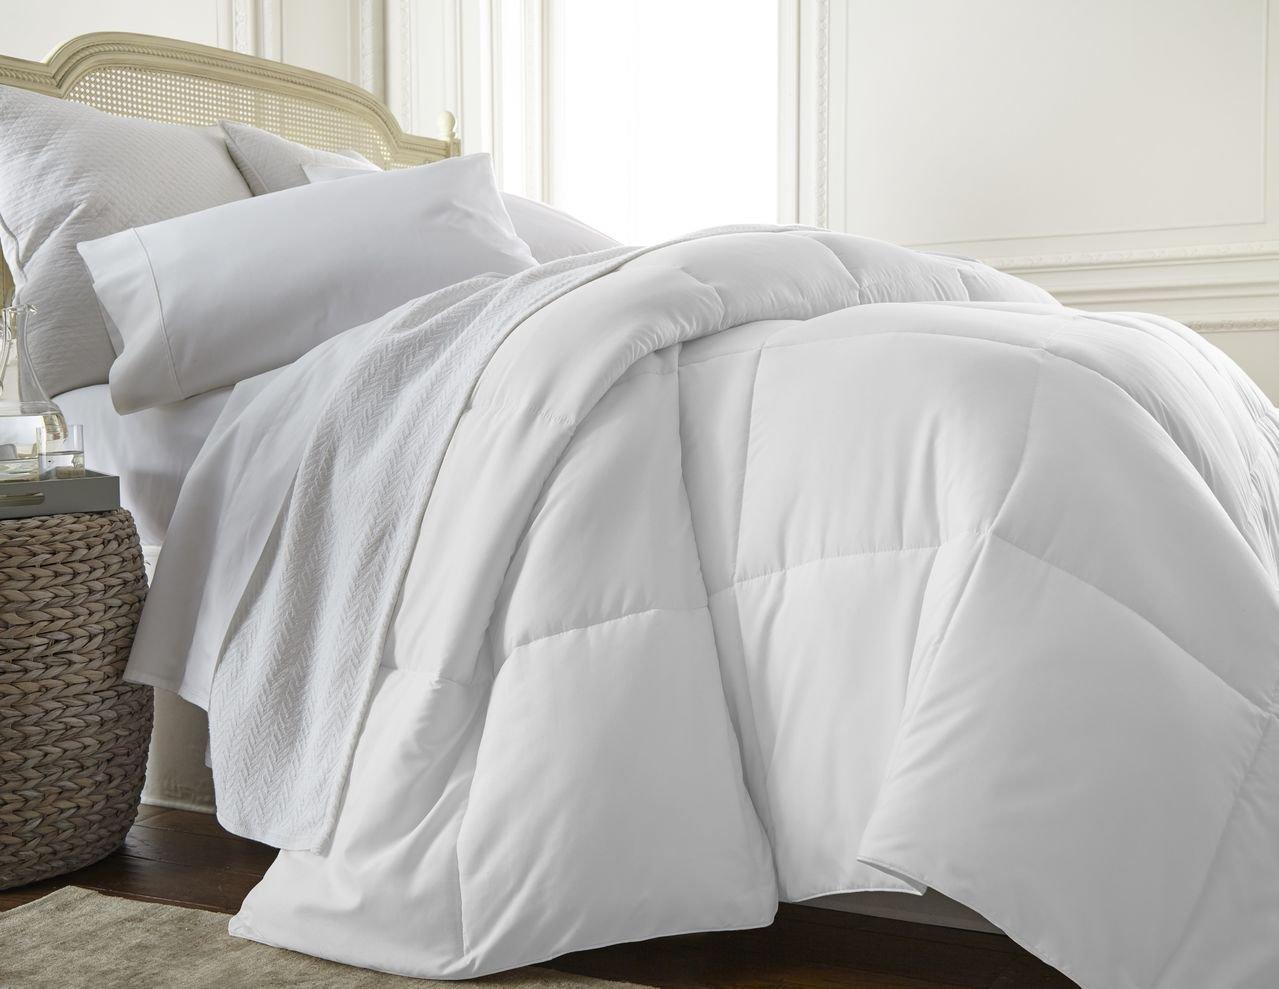 amazoncom ienjoy home collection ultra plush premium down comforter queenfull white home u0026 kitchen - Down Comforters